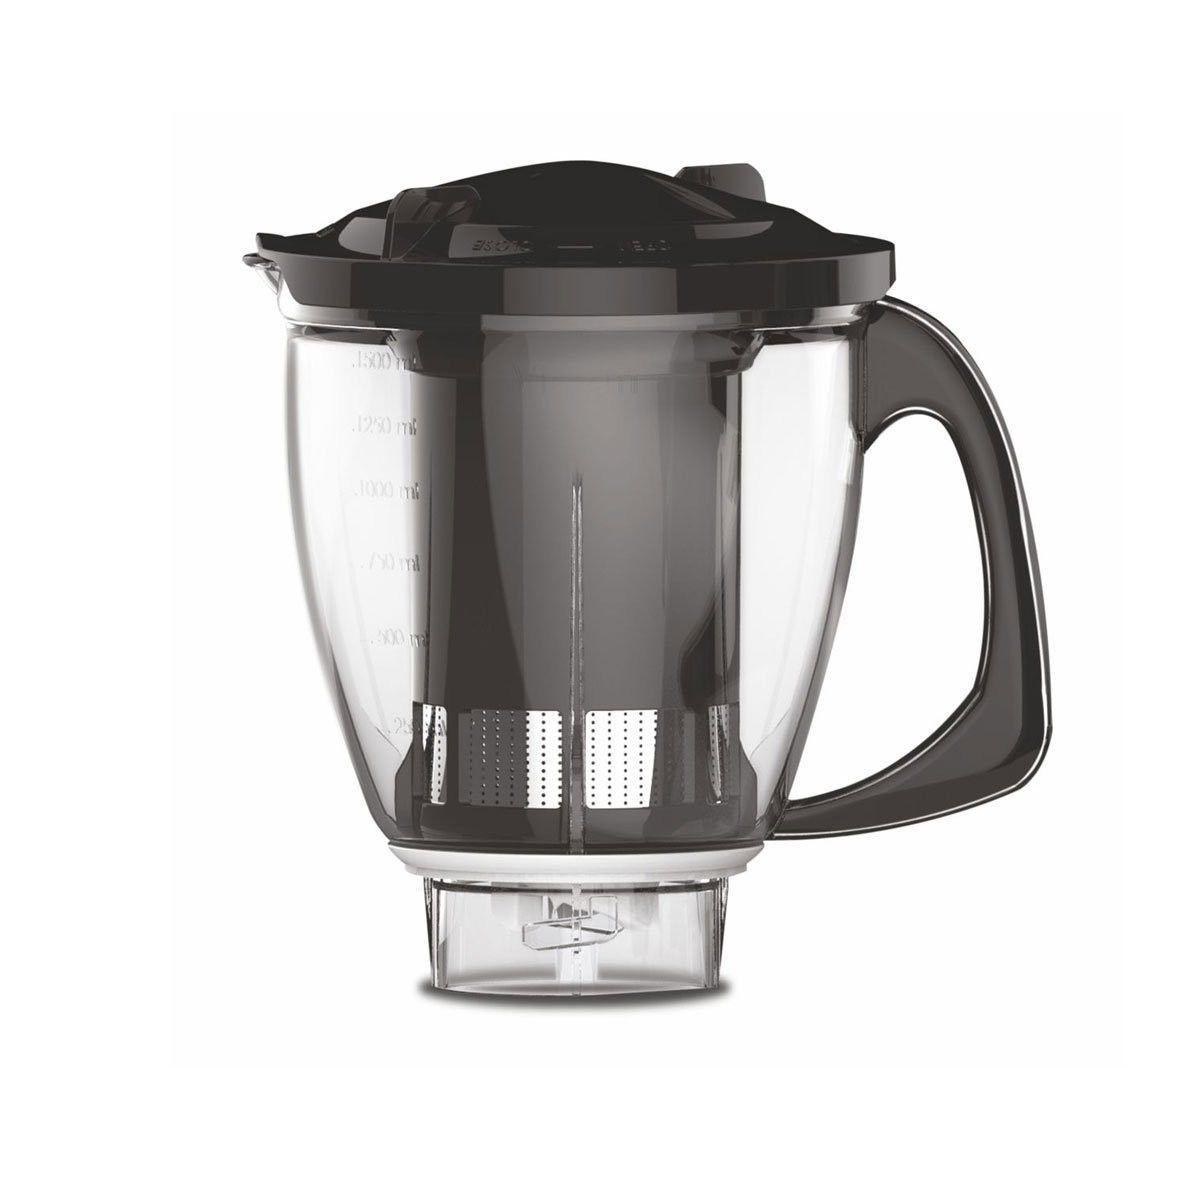 vidiem-eva-nero-plus-650v-3-jars-with-chef-jar-juicer